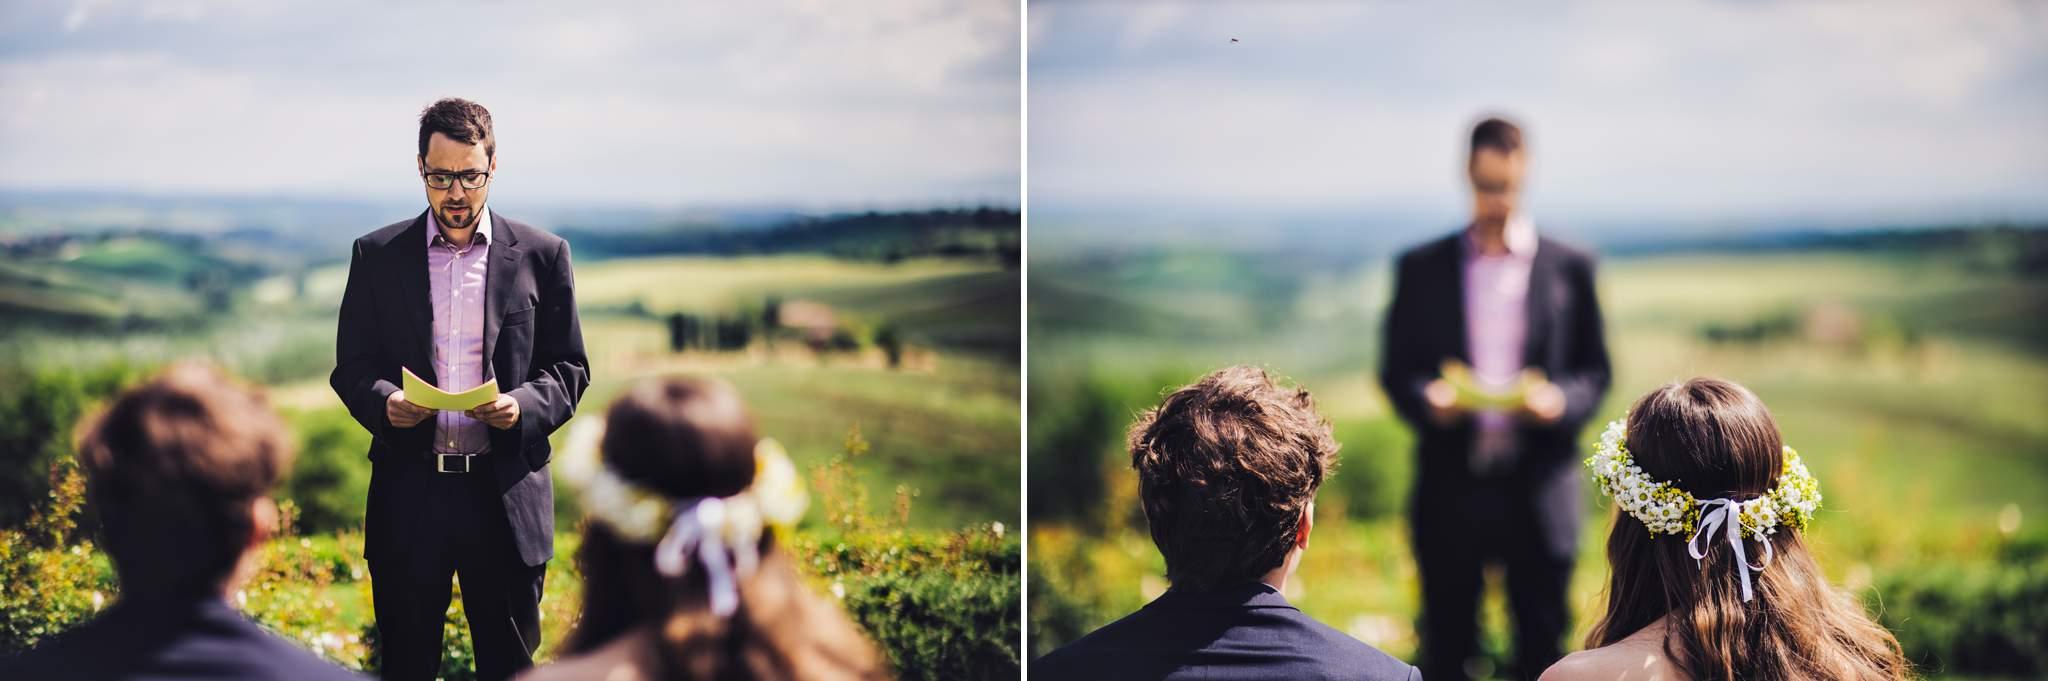 15wedding-photographer-tuscany-siena